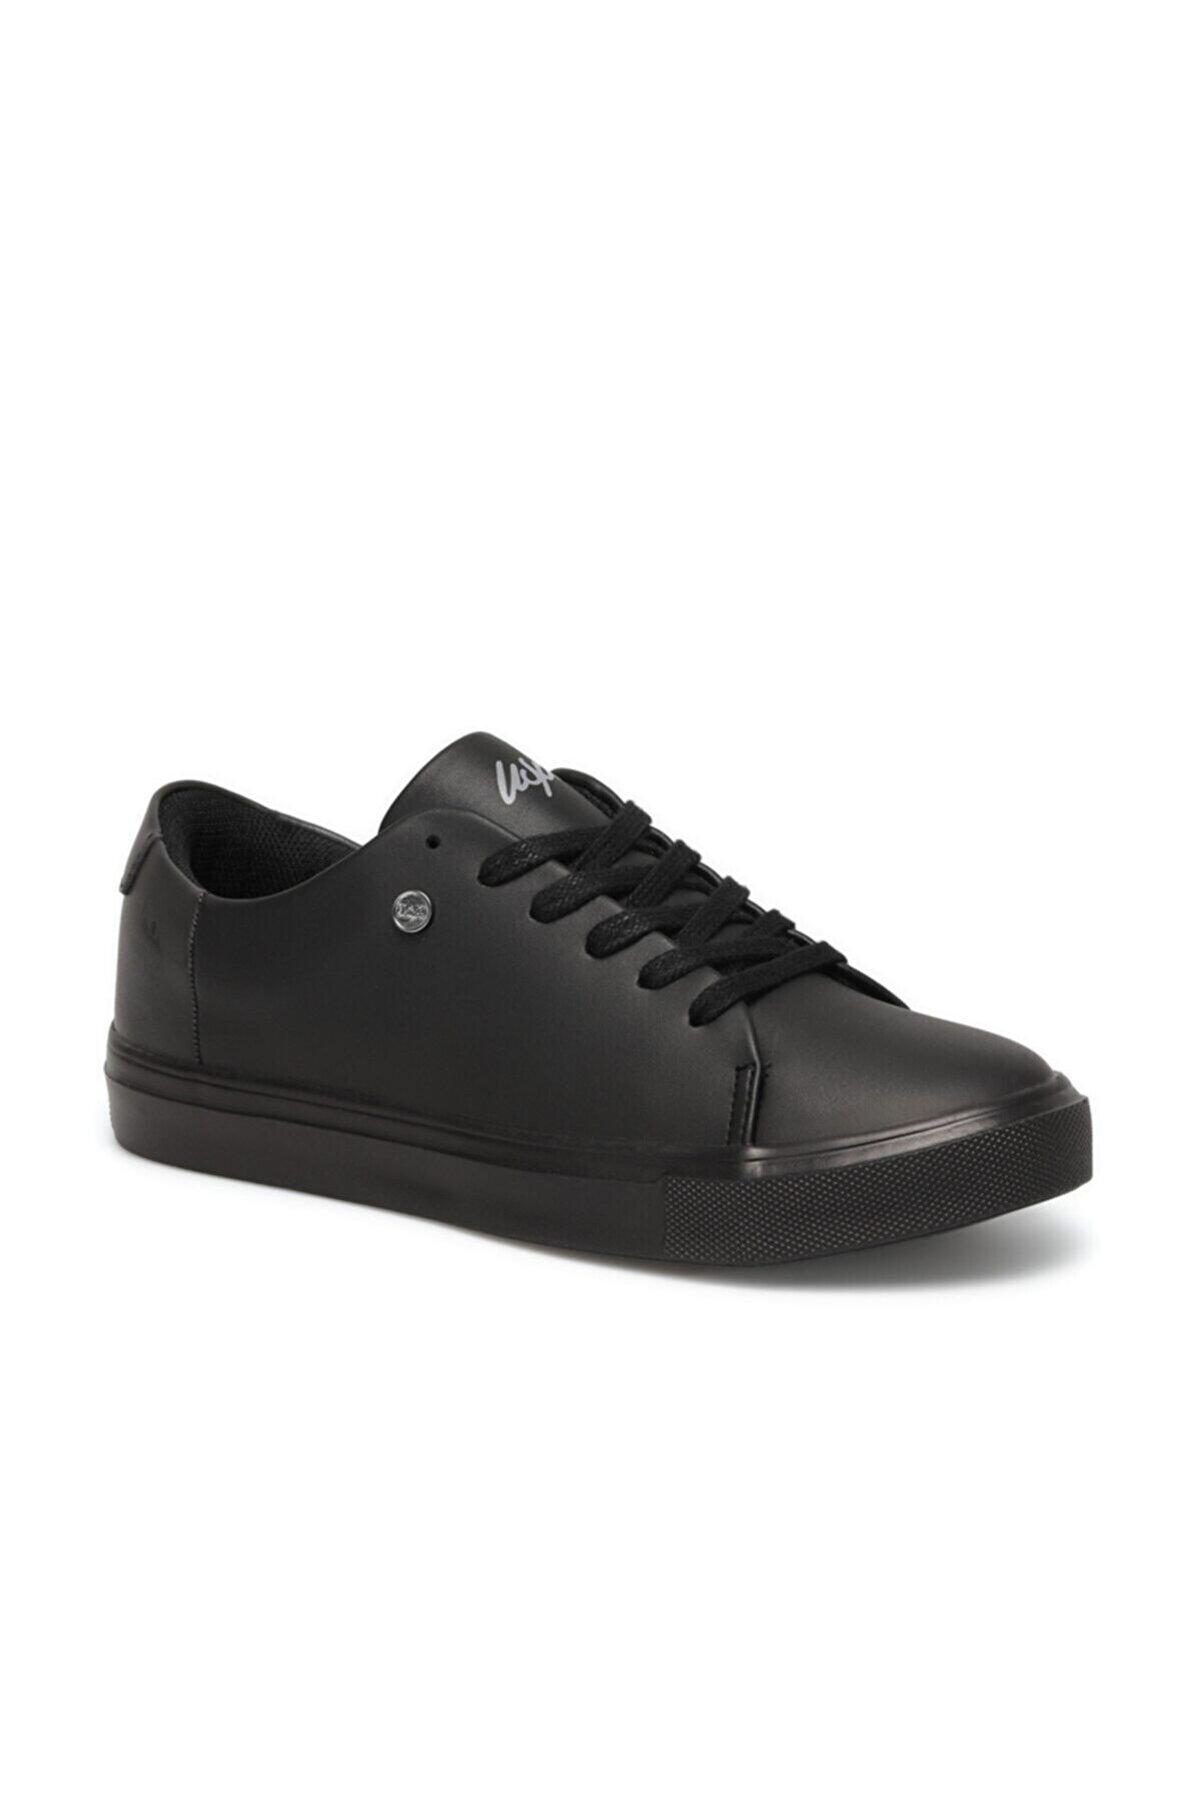 US Polo Assn Kadın Siyah Havuz Taban Sneaker